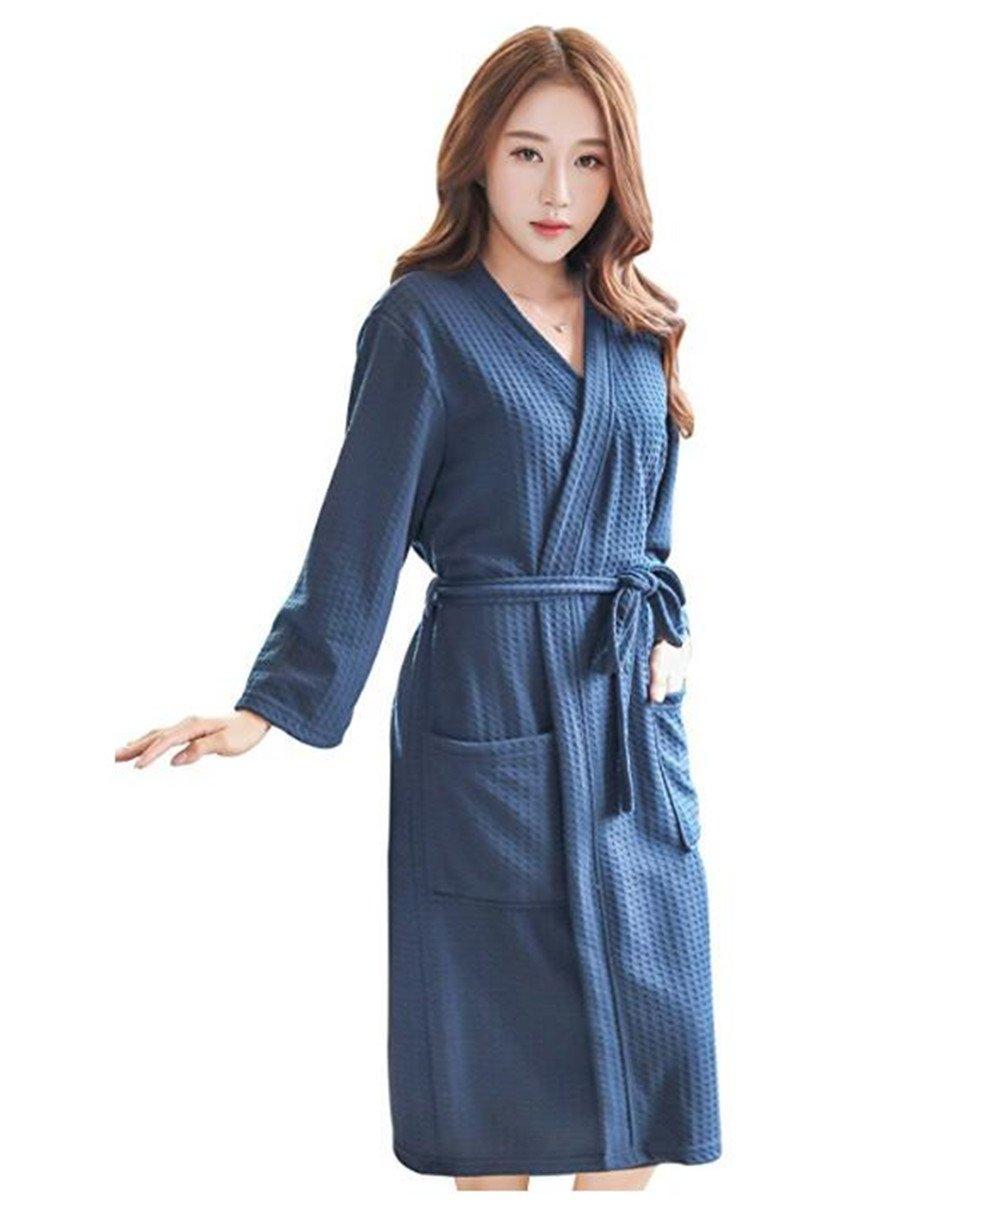 Bhwin Womens Lightweight Robe Kimono 3/4 Long Sleeve Waffle Spa Bathrobe Summer Hotel Spa Robe with Belt (L/XL, Navy Blue)